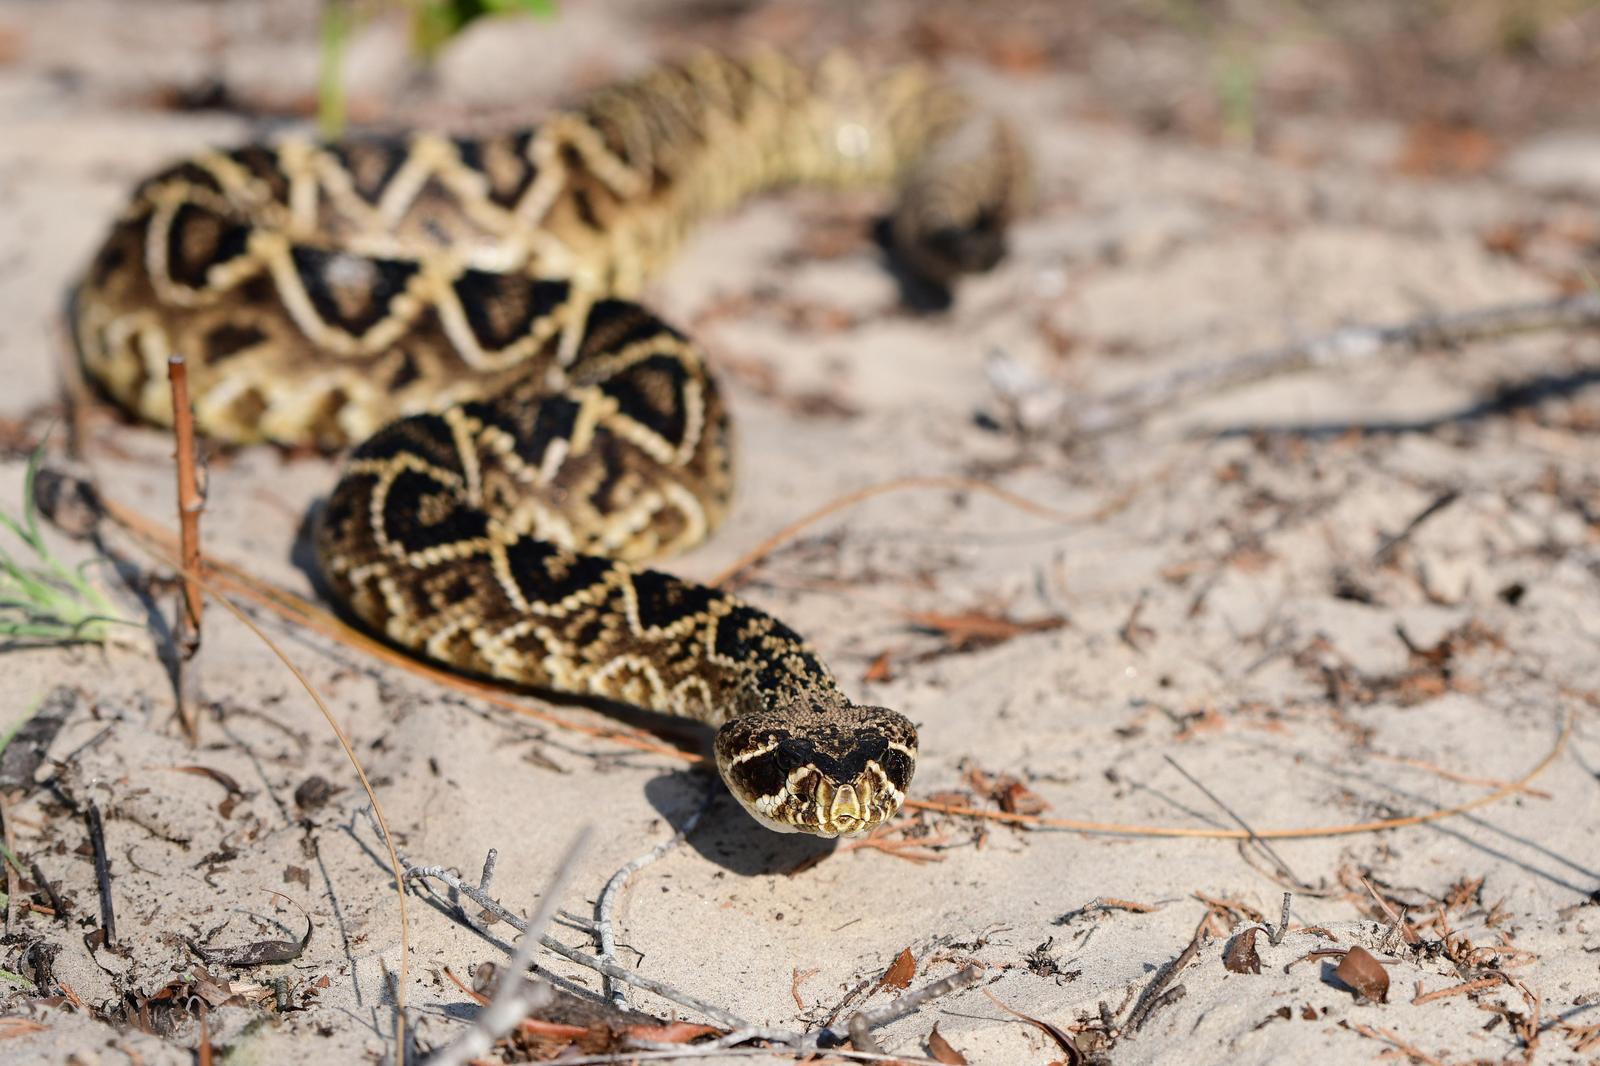 Eastern Diamondback Rattlesnake Photo by Jacob Zadik